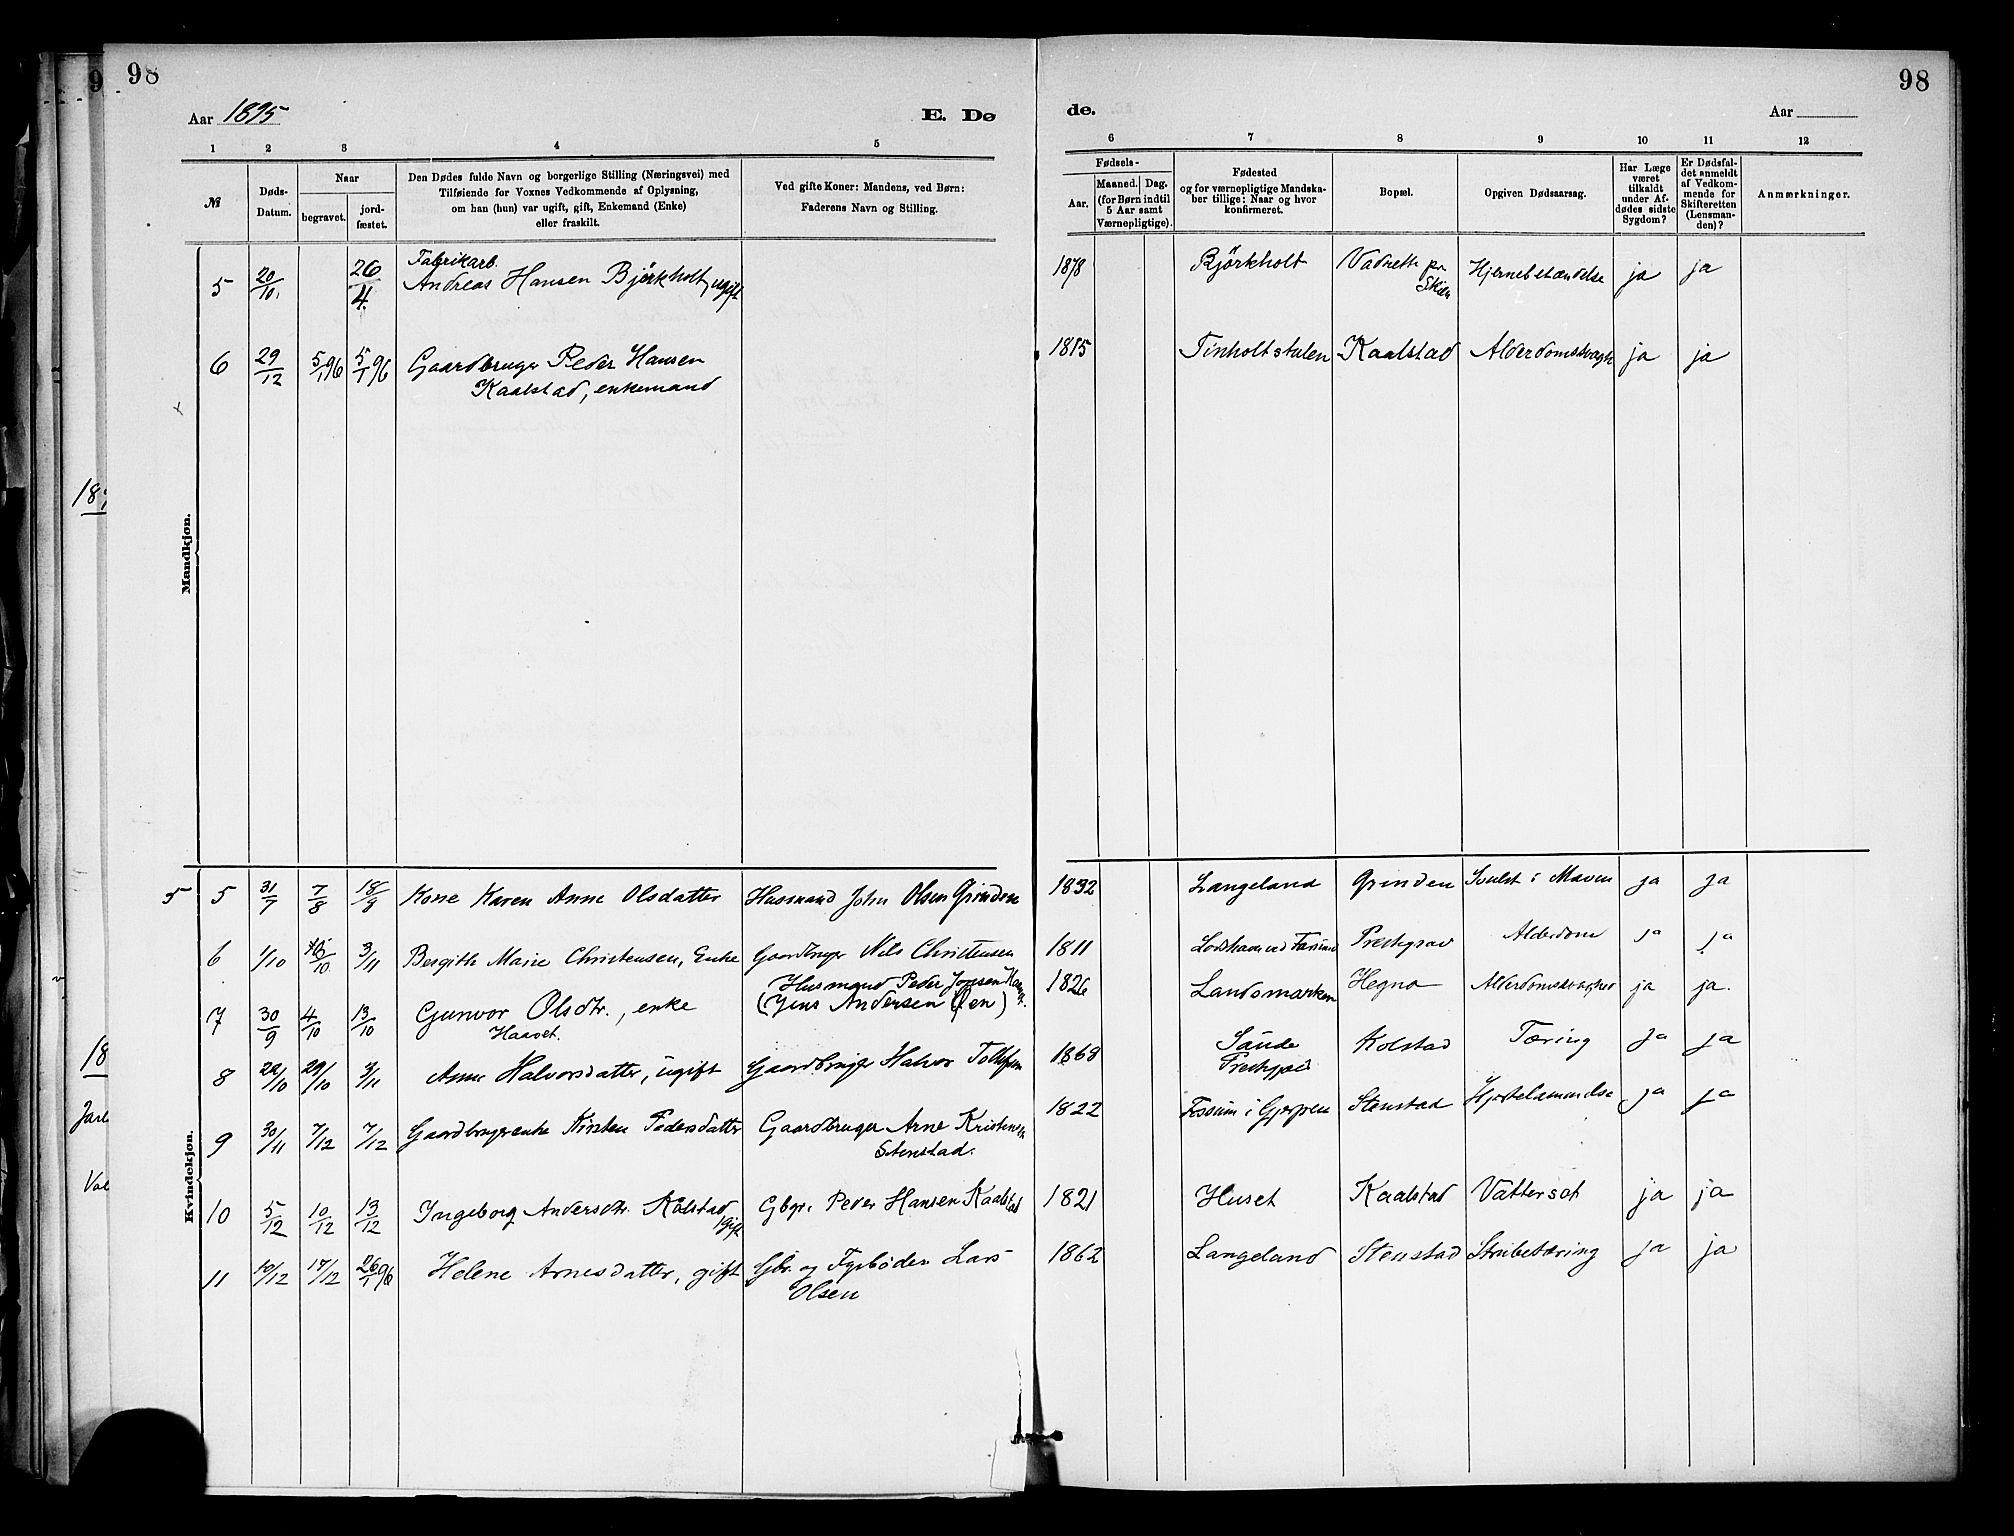 SAKO, Holla kirkebøker, F/Fa/L0009: Ministerialbok nr. 9, 1881-1897, s. 98